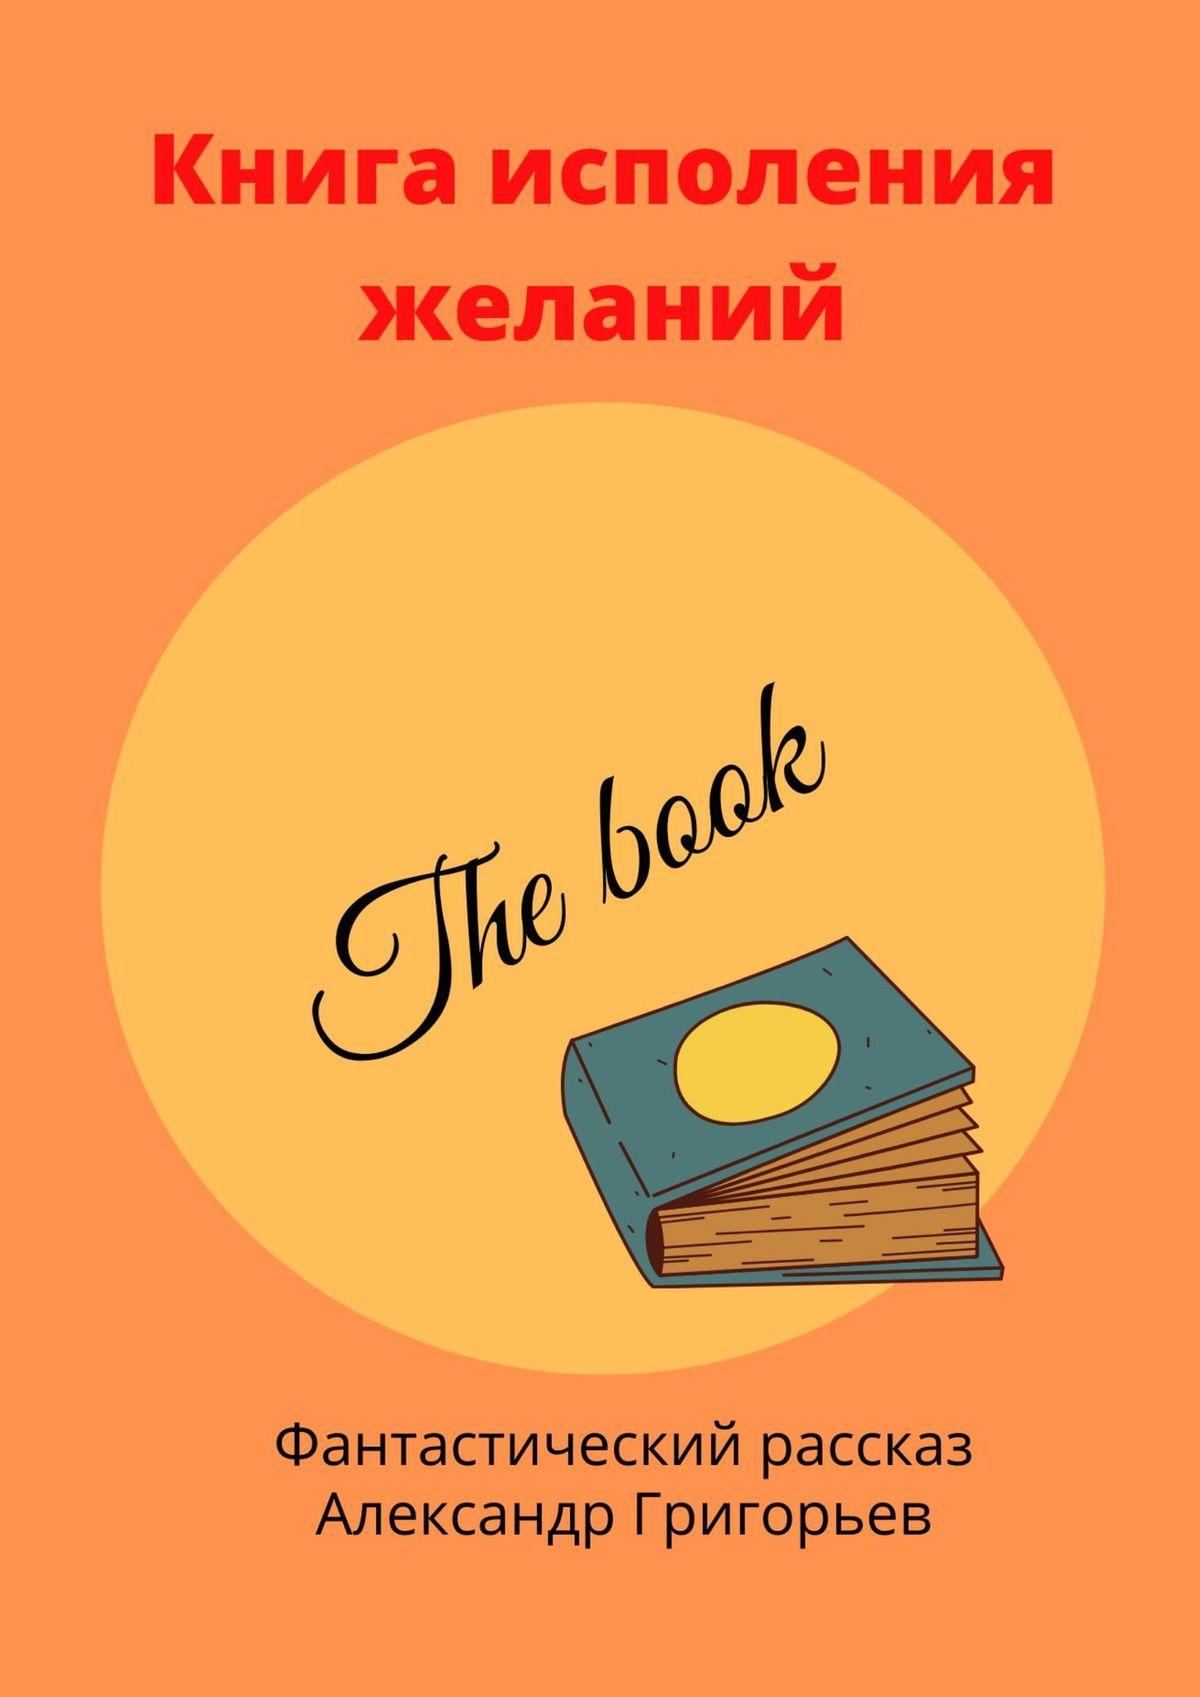 Александр Владимирович Григорьев Книга исполнения желаний